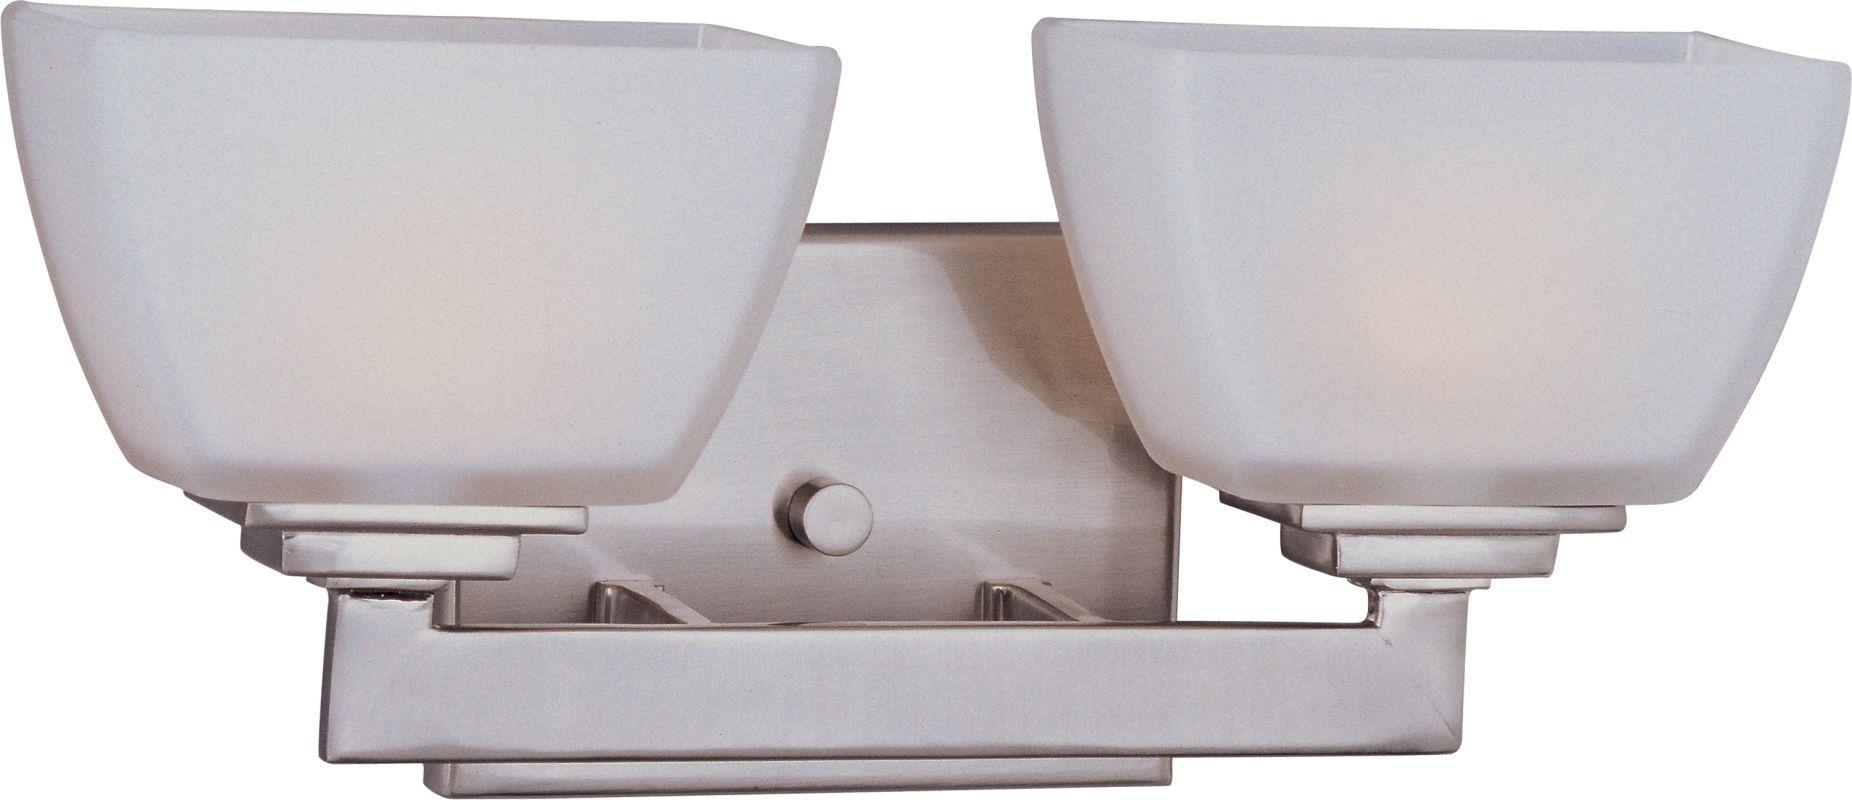 Maxim 9032 Satin Nickel / Satin White Glass  Maxim 9032 Angle 13